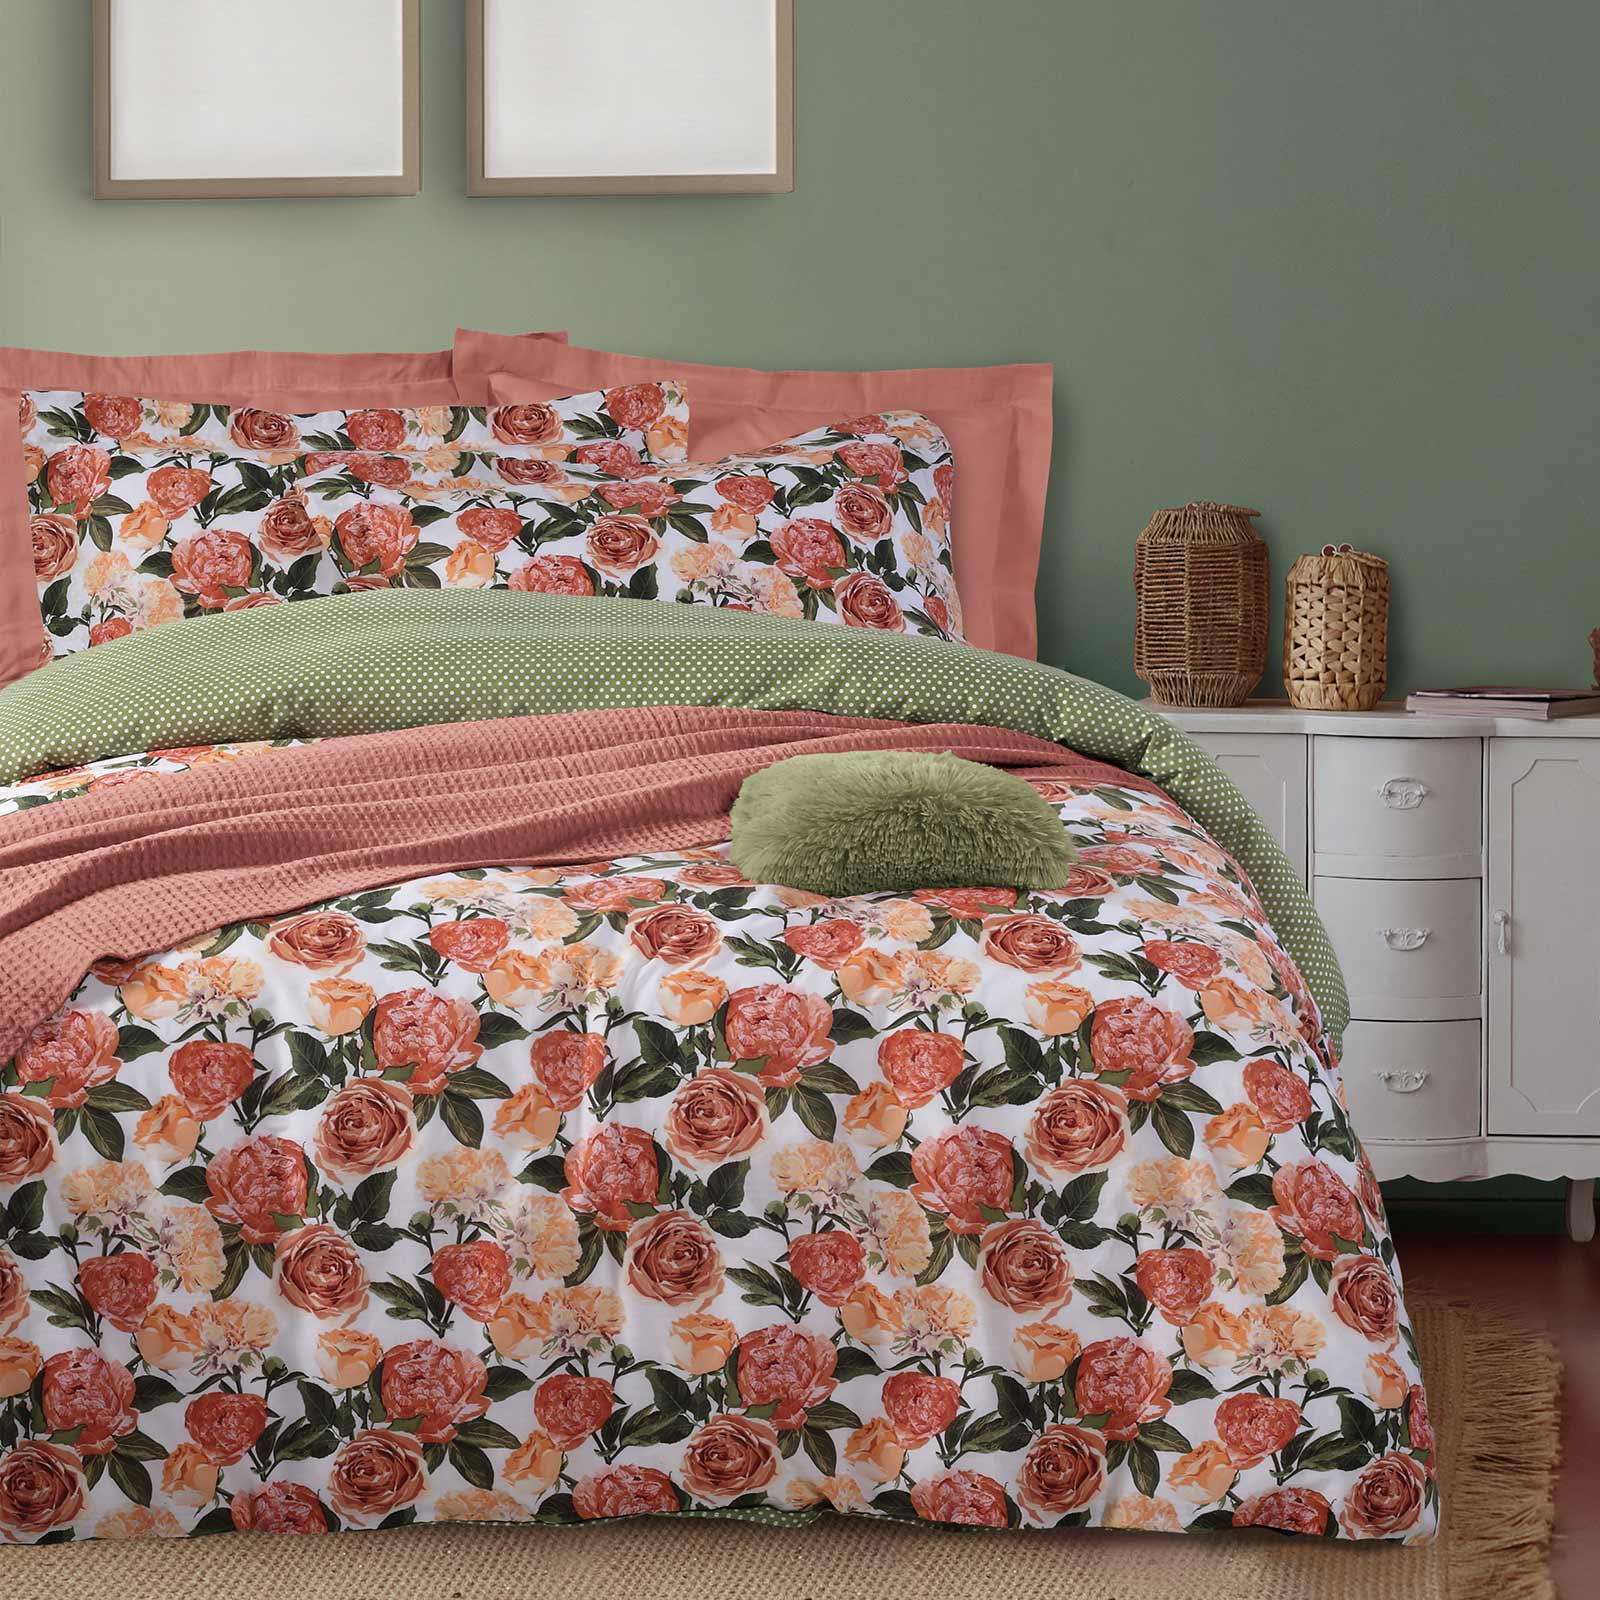 Das Home Σετ Παπλωματοθηκη Υπερδιπλη Happy 9540 Κοραλι – Πρασινο – Ροζ